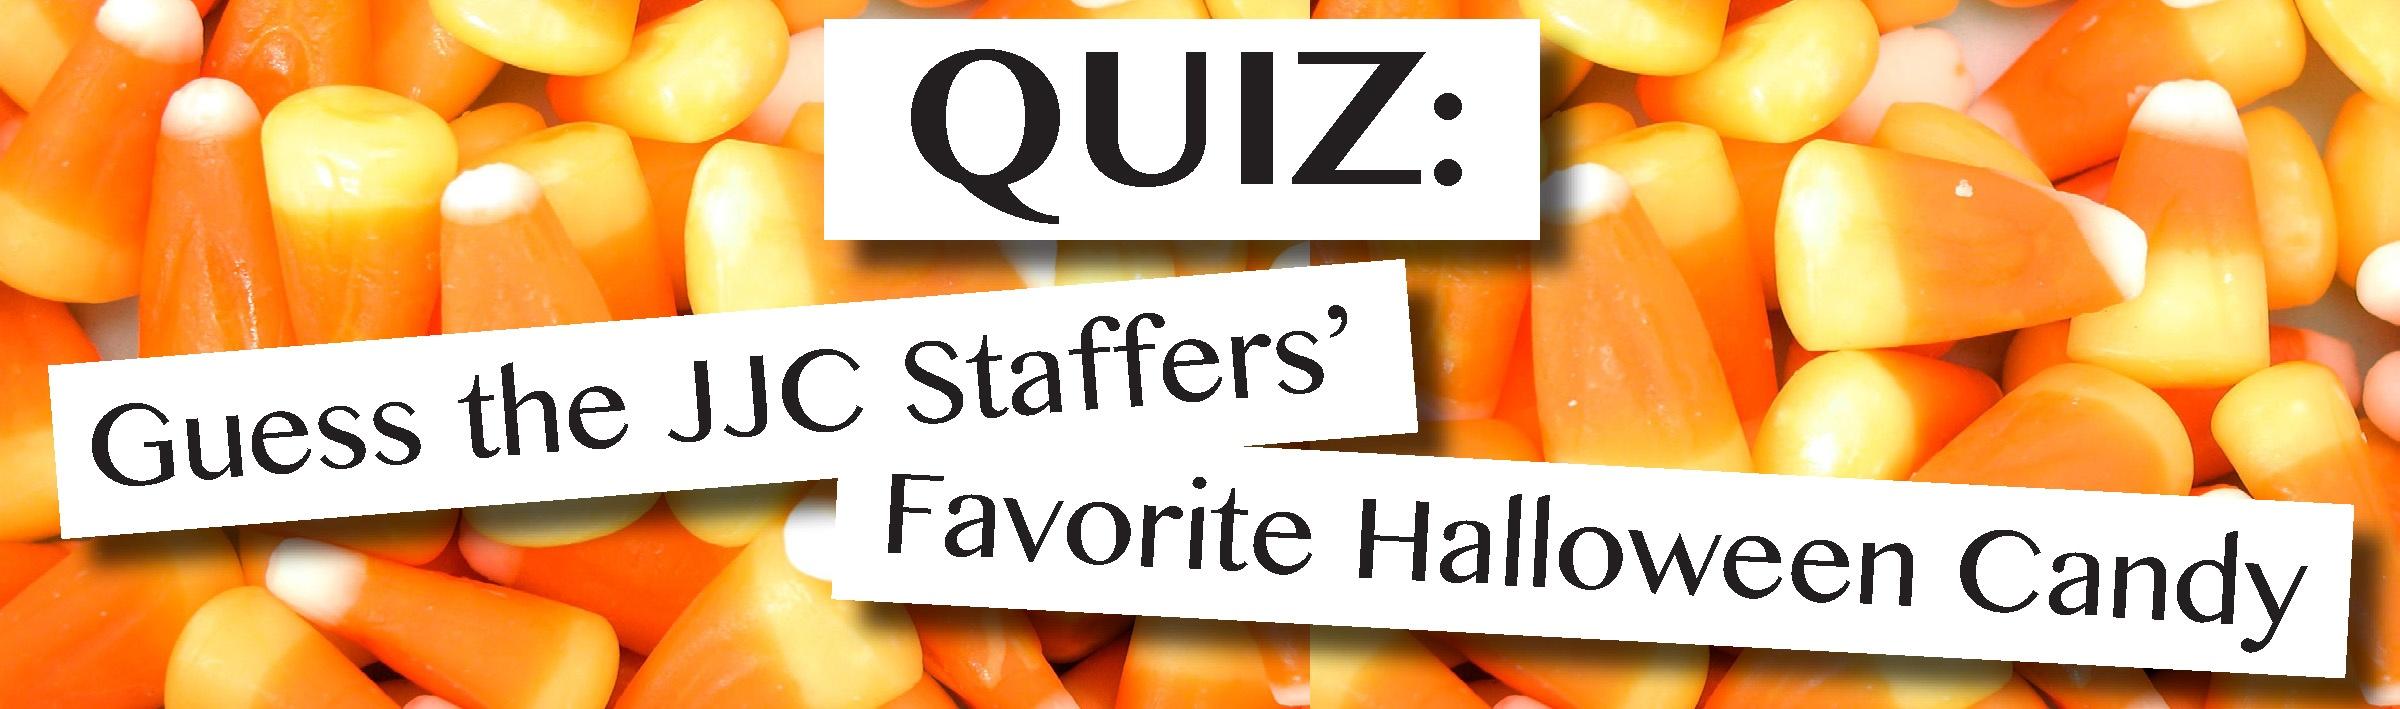 quiz guess the jjc staffers favorite halloween candy